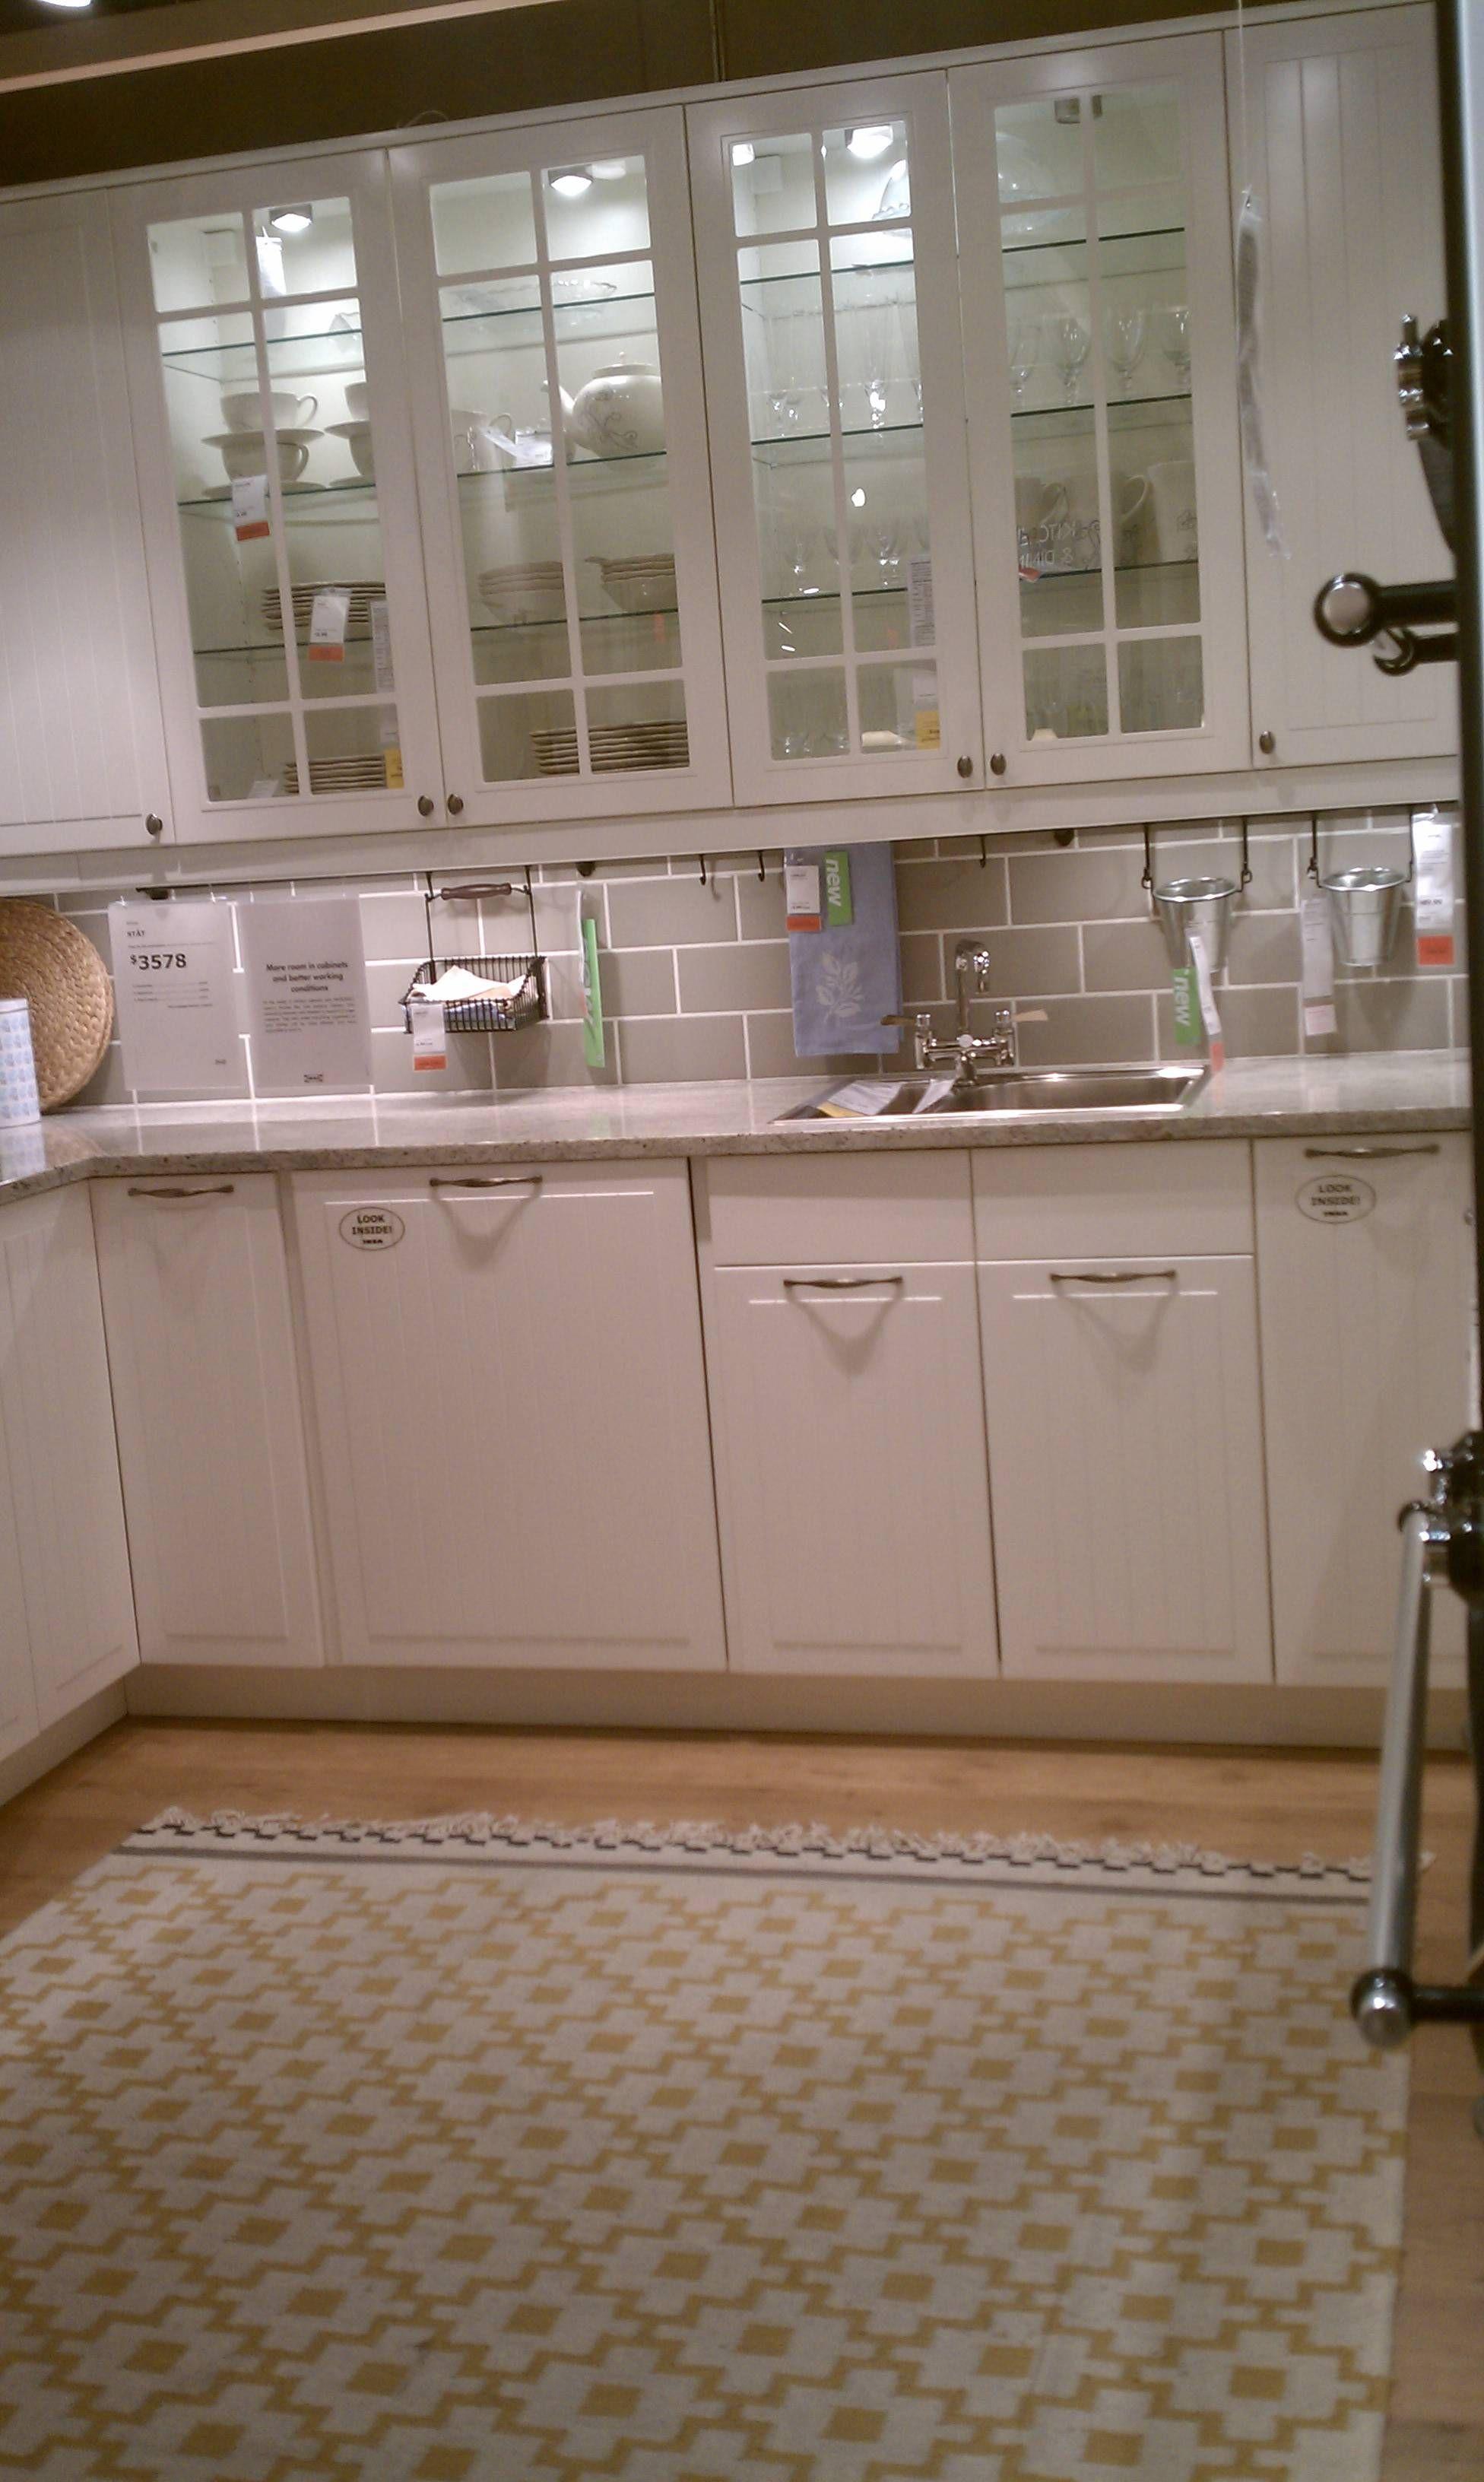 ikea kitchen rug nutone exhaust fan lurv that integrated dishwasher